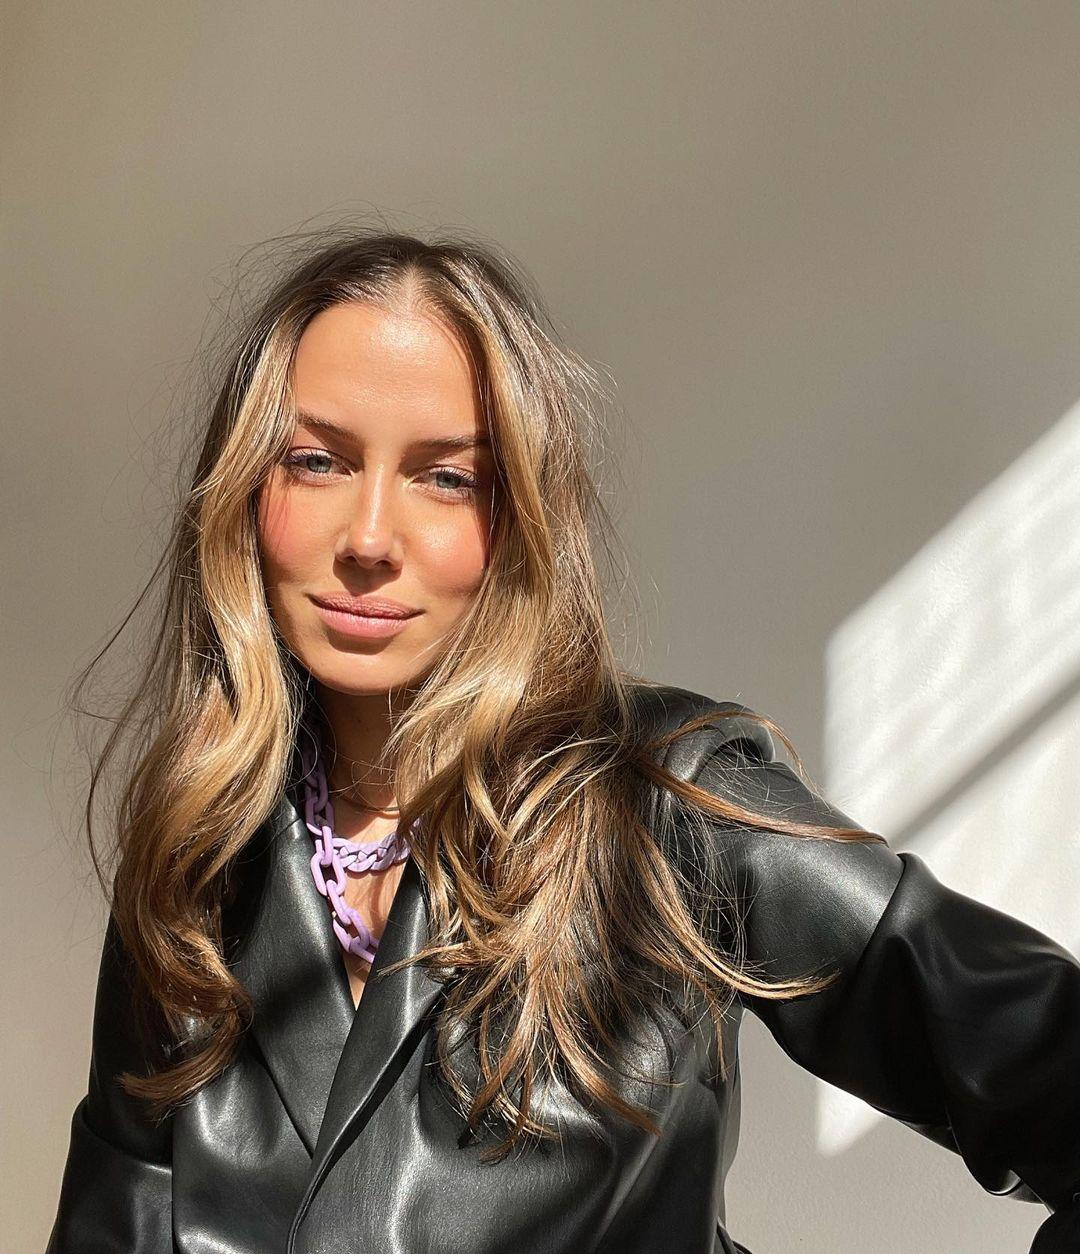 Nicole-Poturalski-Wallpapers-Insta-Fit-Bio-4